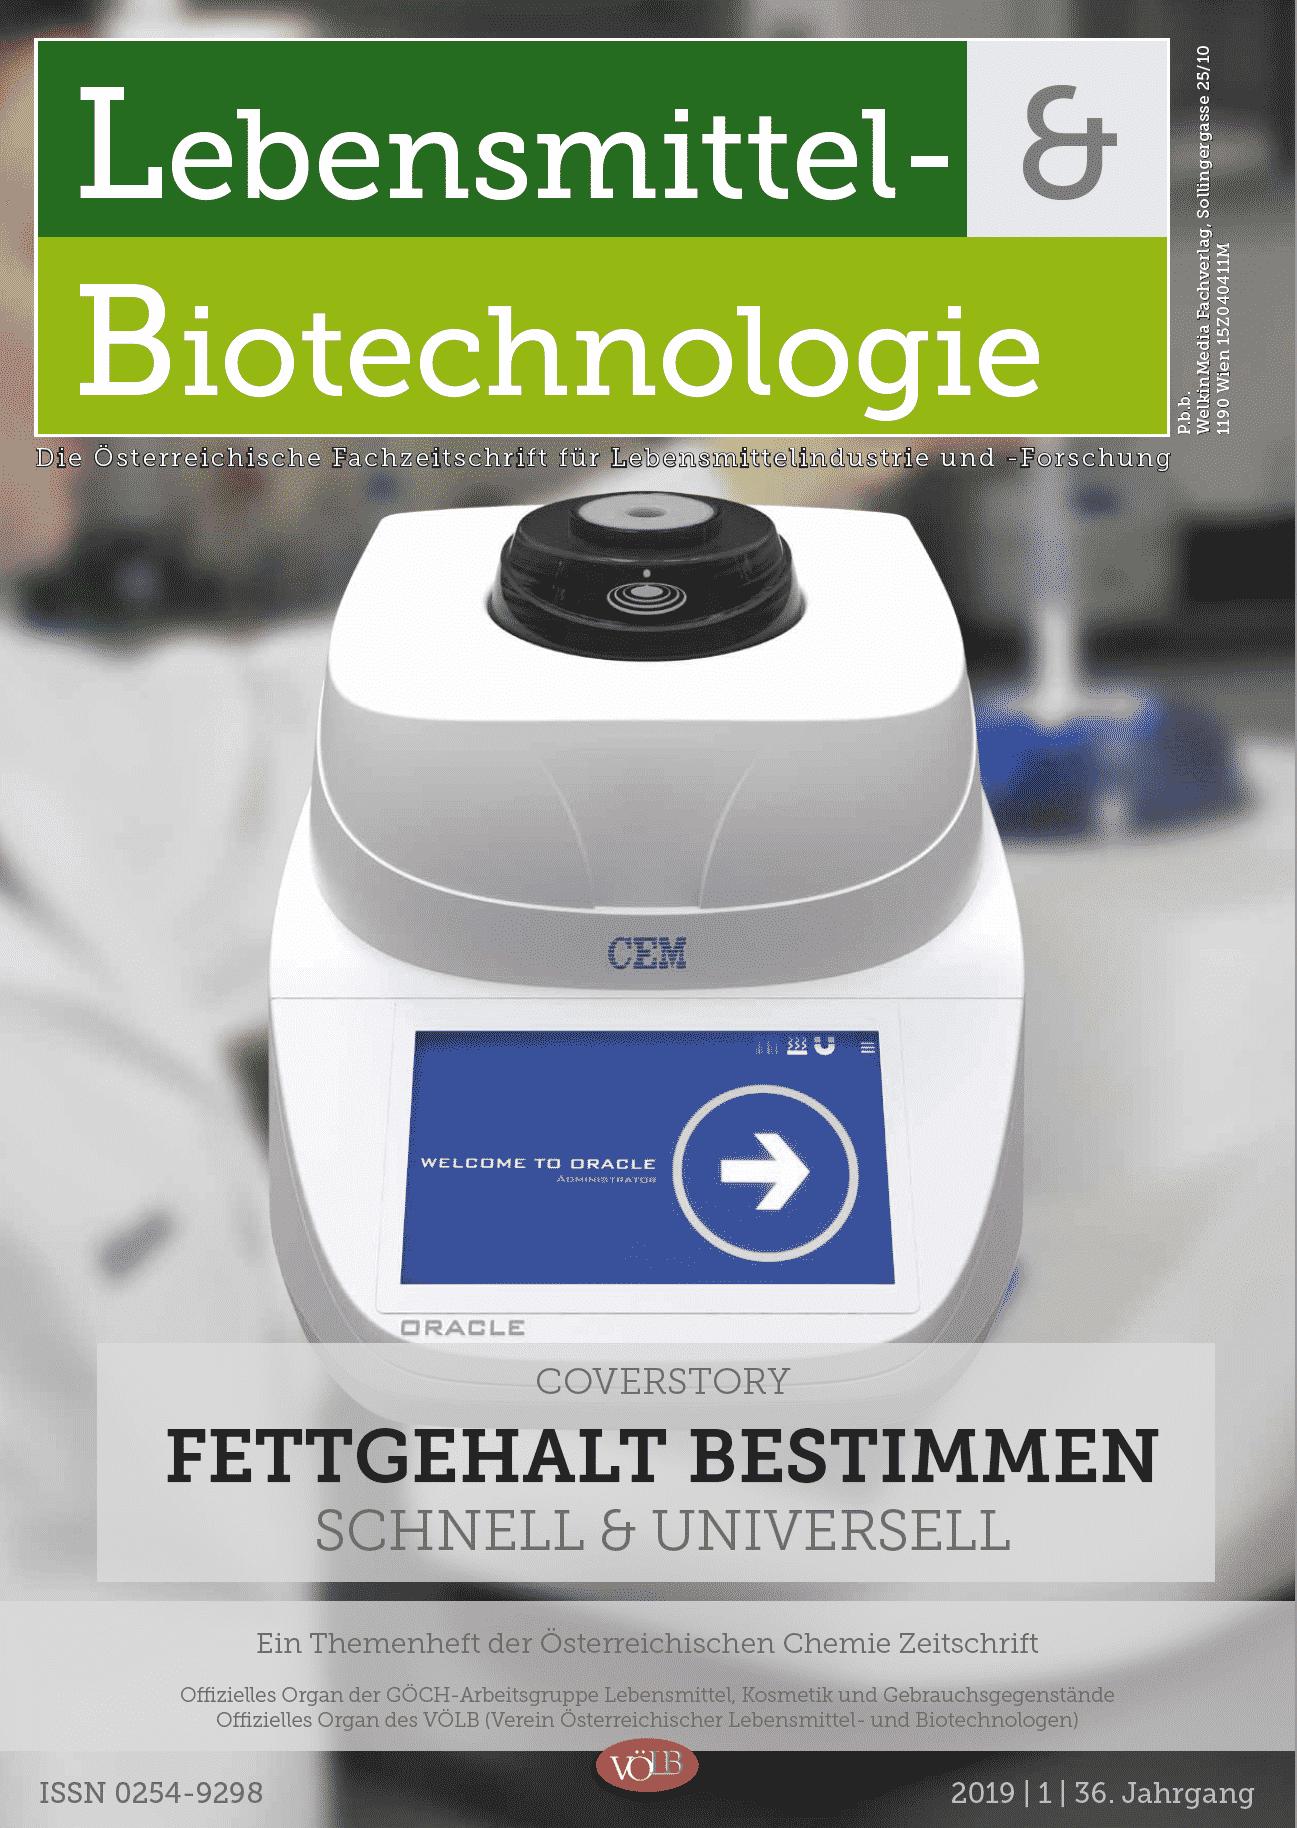 Lebensmittel-&Biotechnologie, 2019, 01